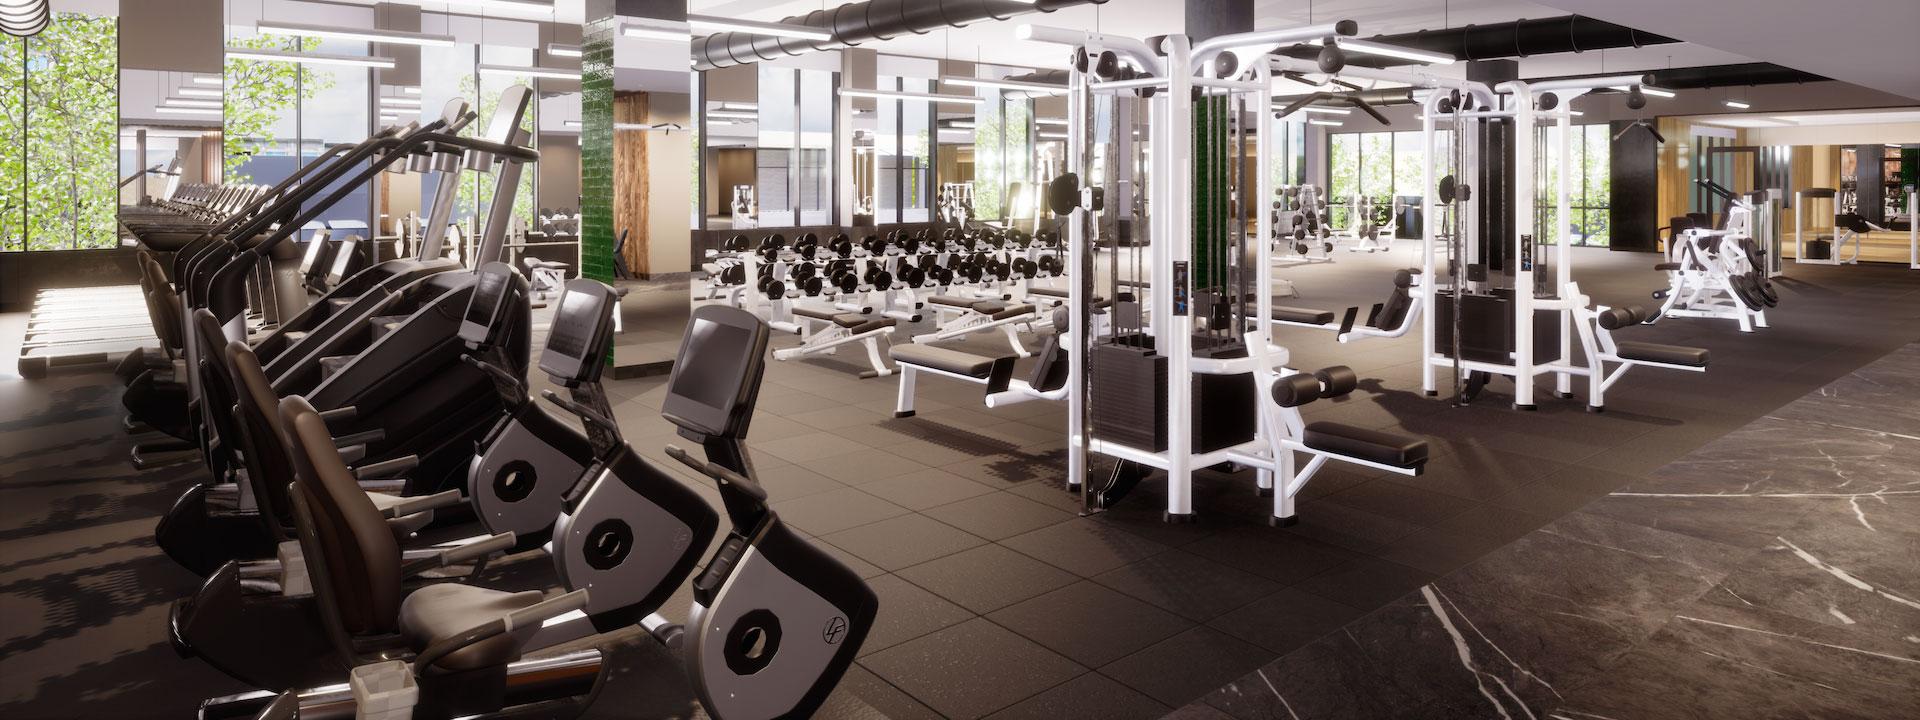 Best gyms in tx at austin equinox